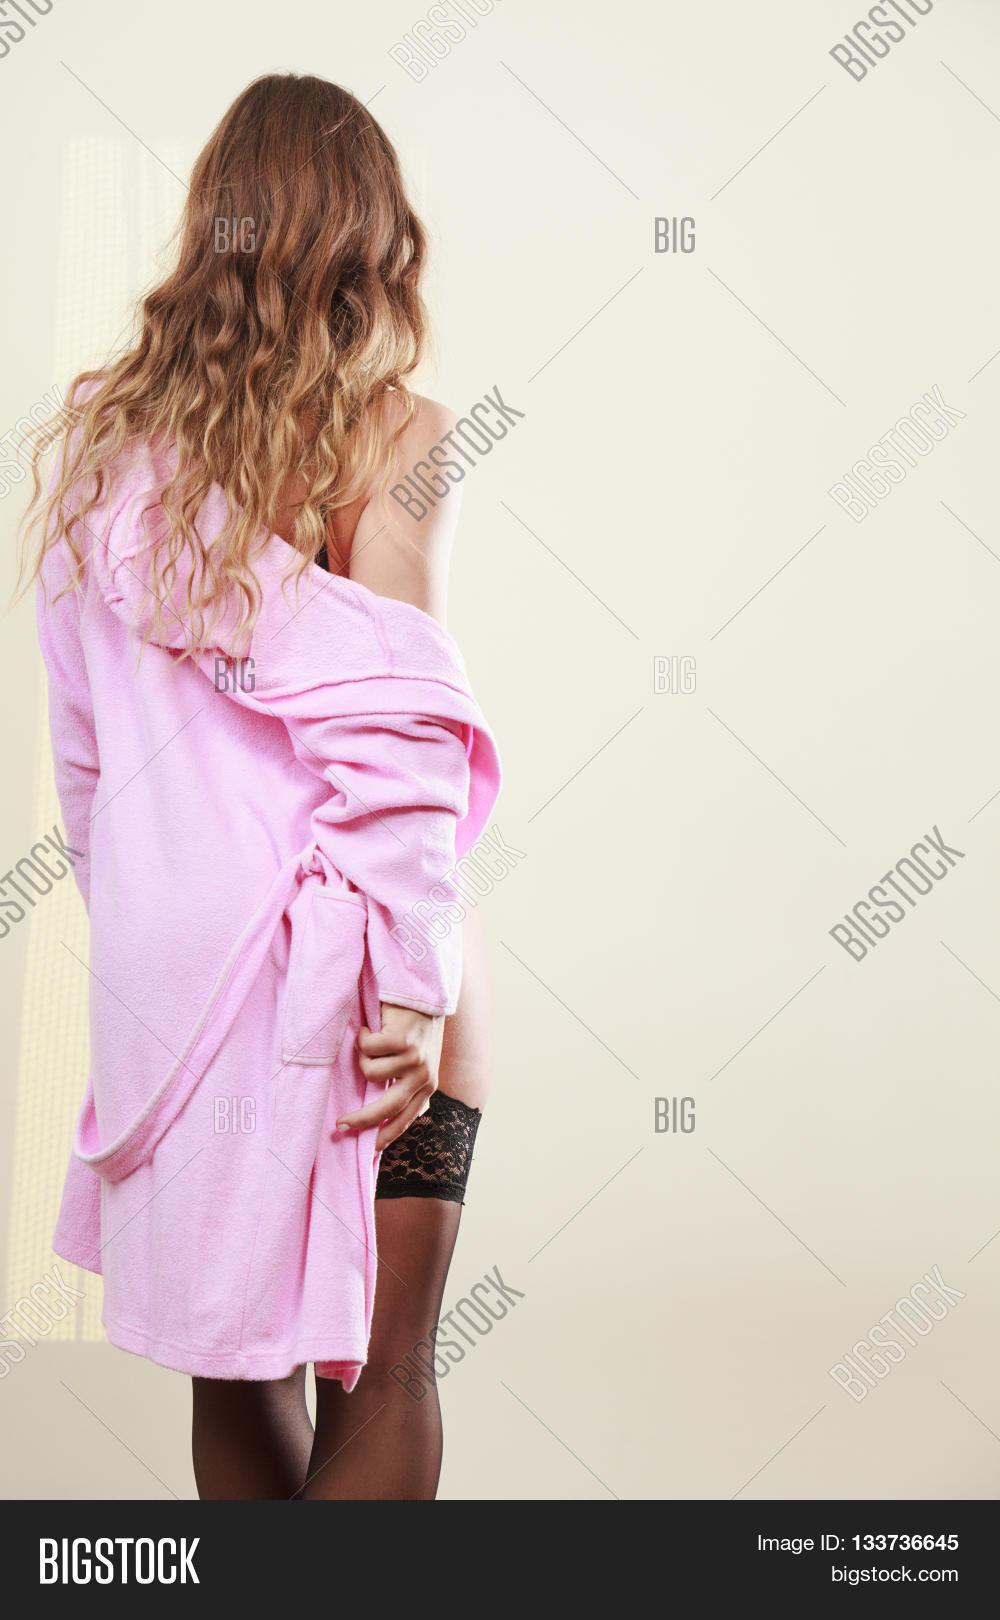 Seductive Lady Image & Photo (Free Trial) | Bigstock